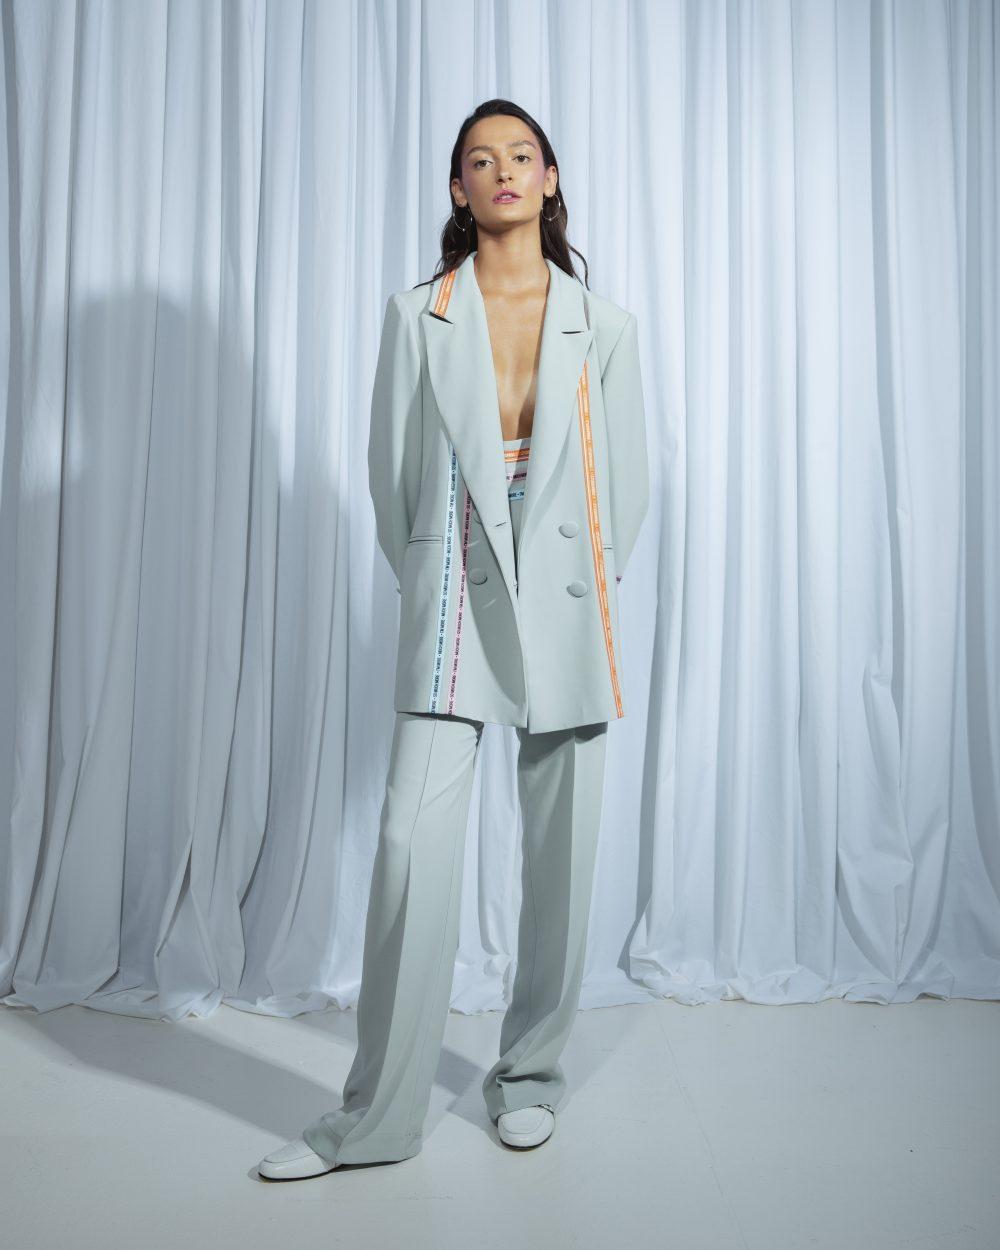 389A9998 e1604583455802 Atraktivni modeli i specijalne video prezentacije – Perwoll Fashion Week